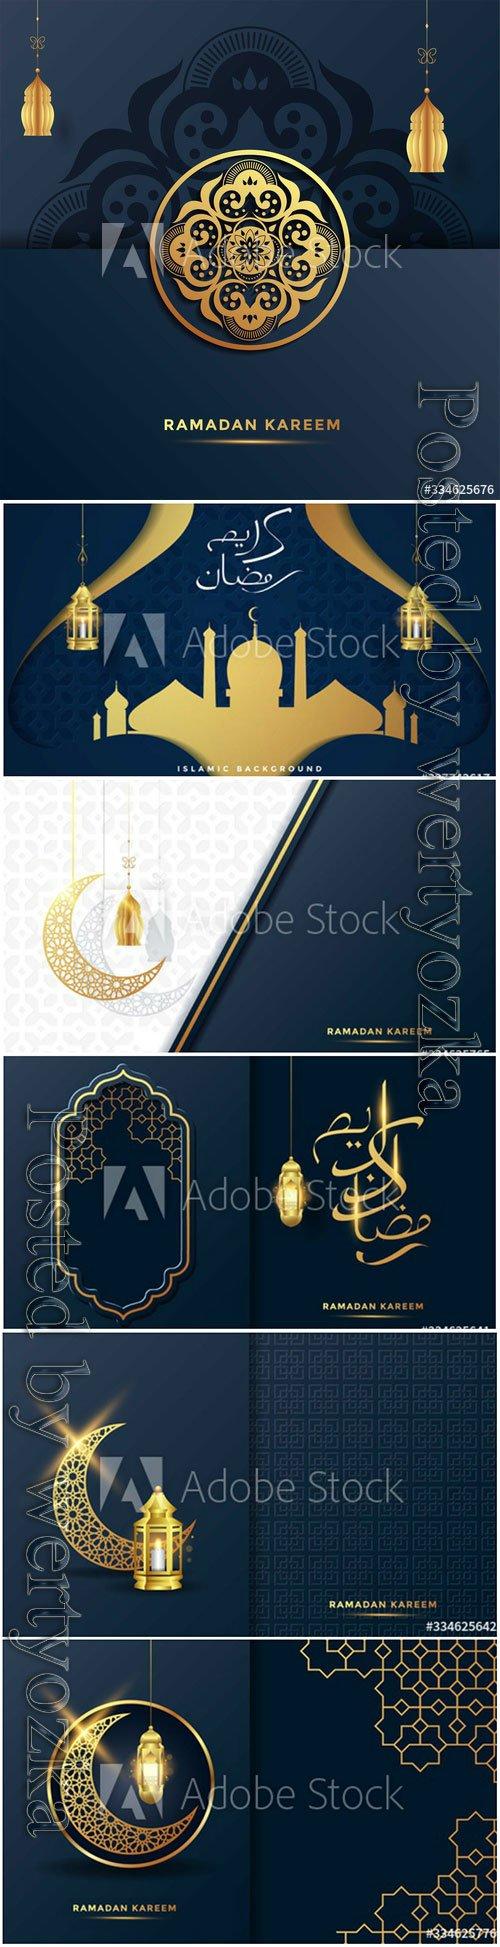 Ramadan Kareem vector background, Eid mubarak greeting card # 2